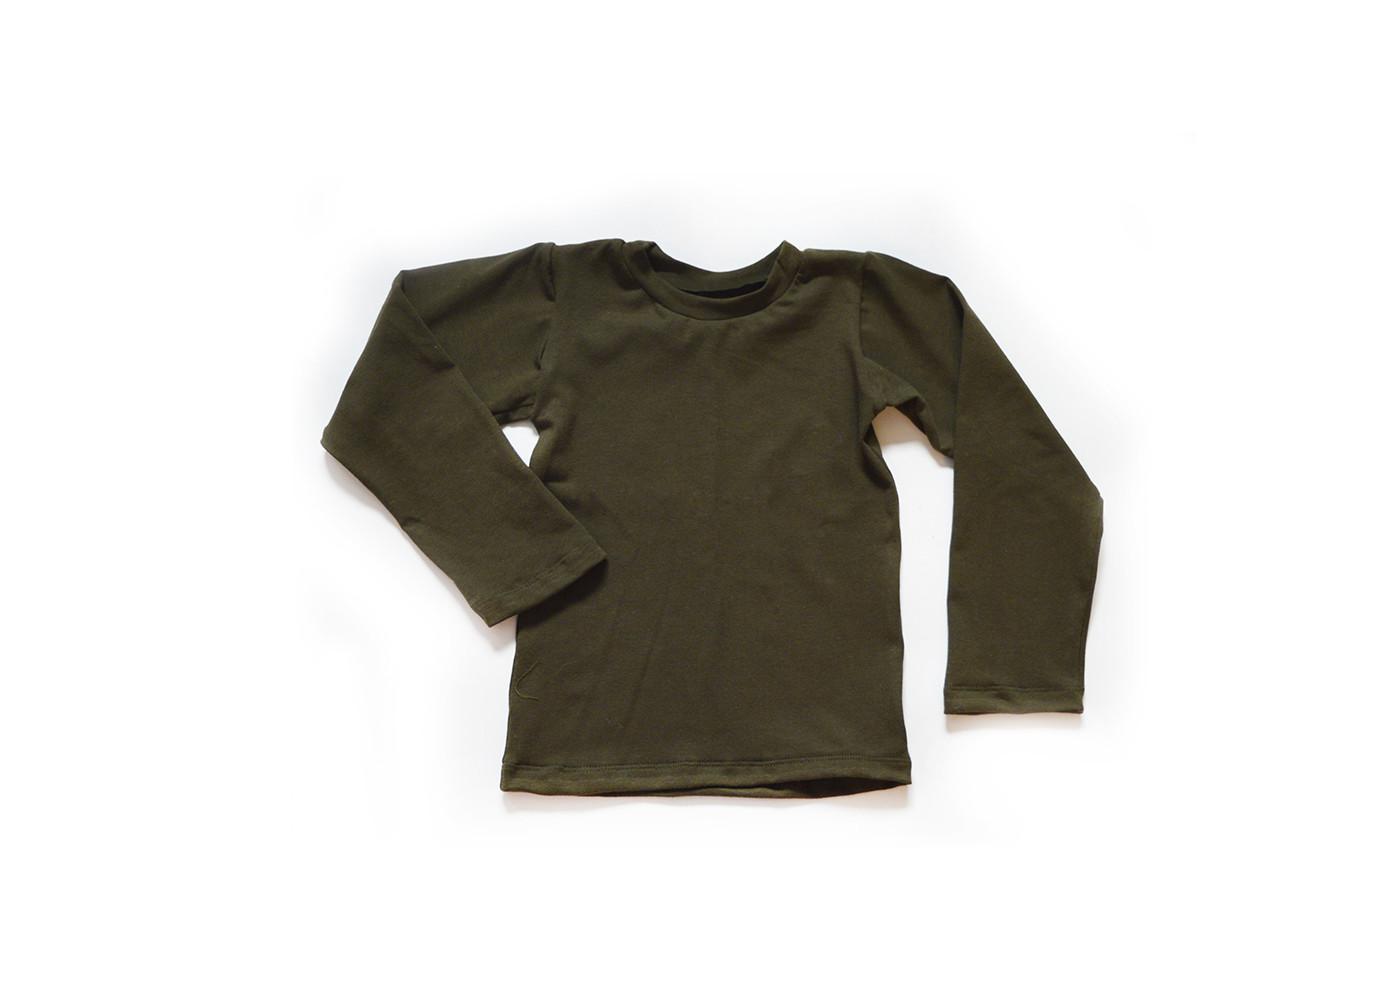 Little Kids Long Sleeve T shirt Dark Olive